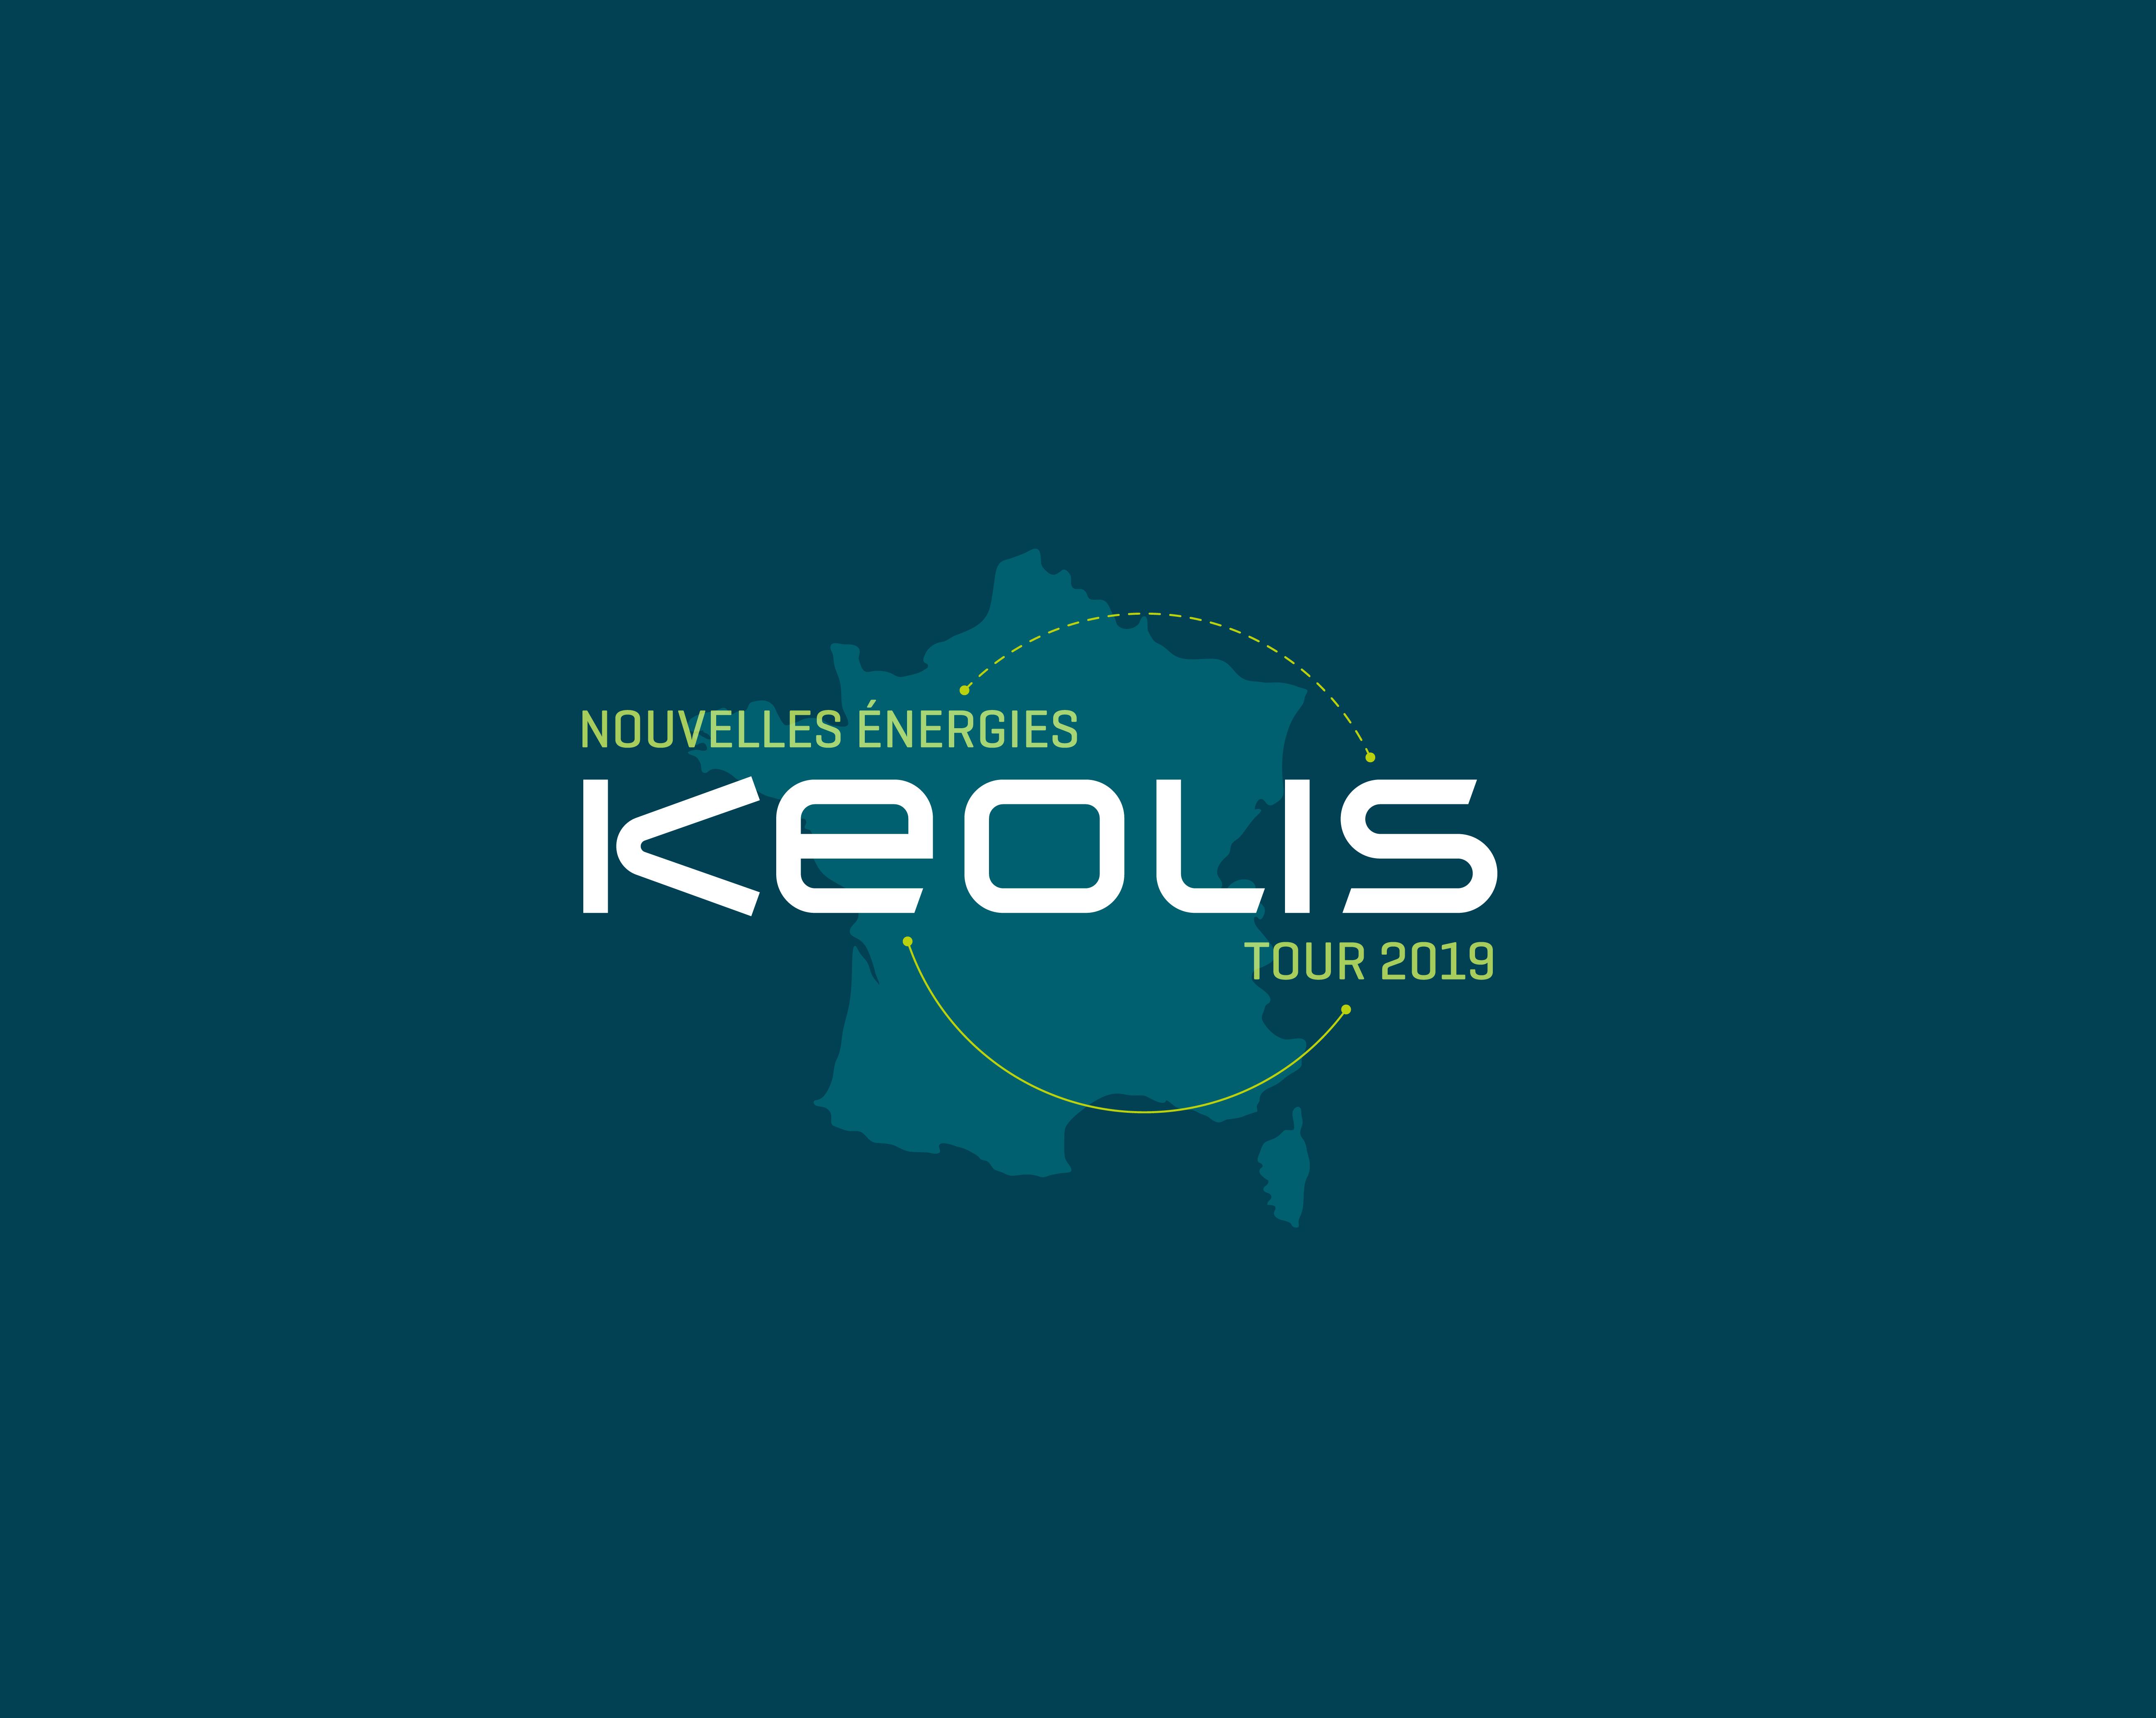 right LOGO-KEOLIS-TOUR-2019-FRANCE-NOUVELLES-ENERGIES